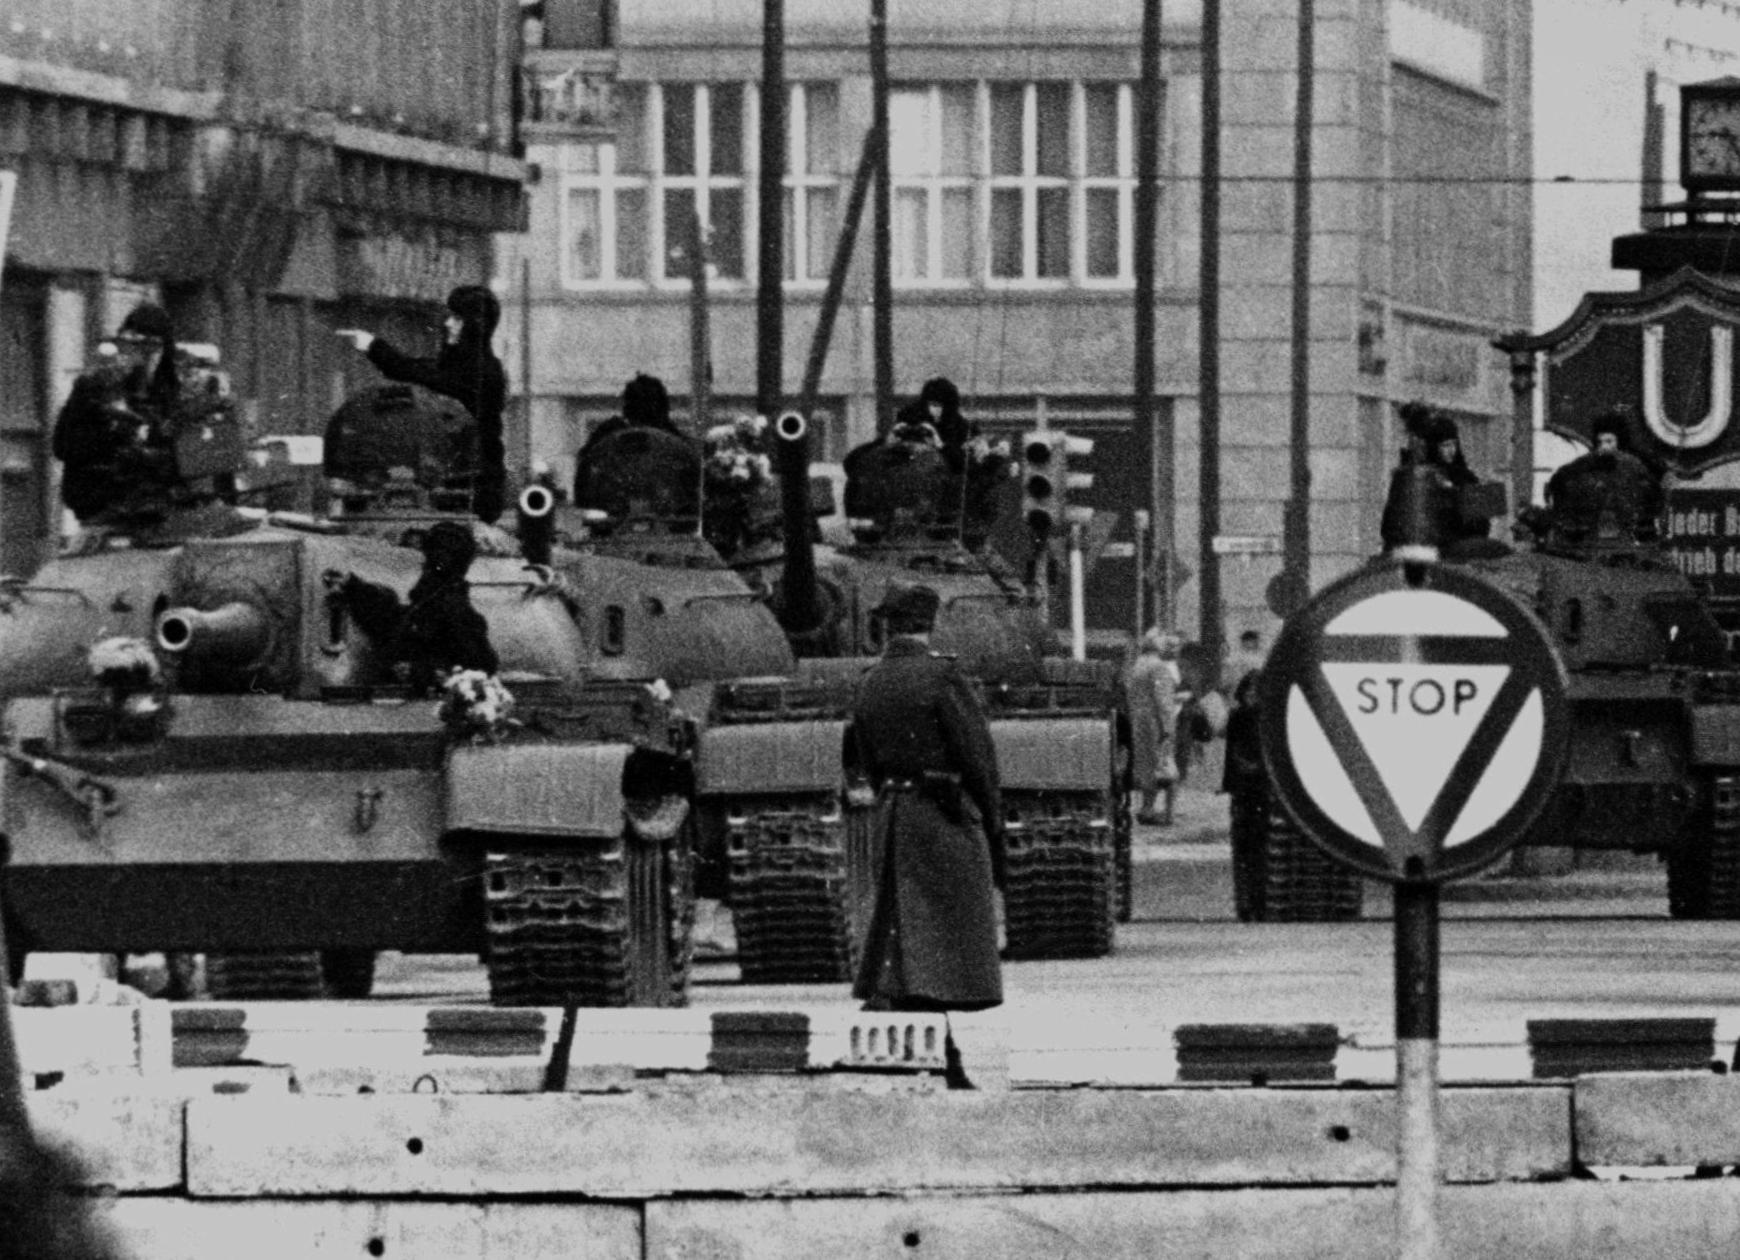 Soviet T-55 tanks at Checkpoint Charlie, October 27, 1961.